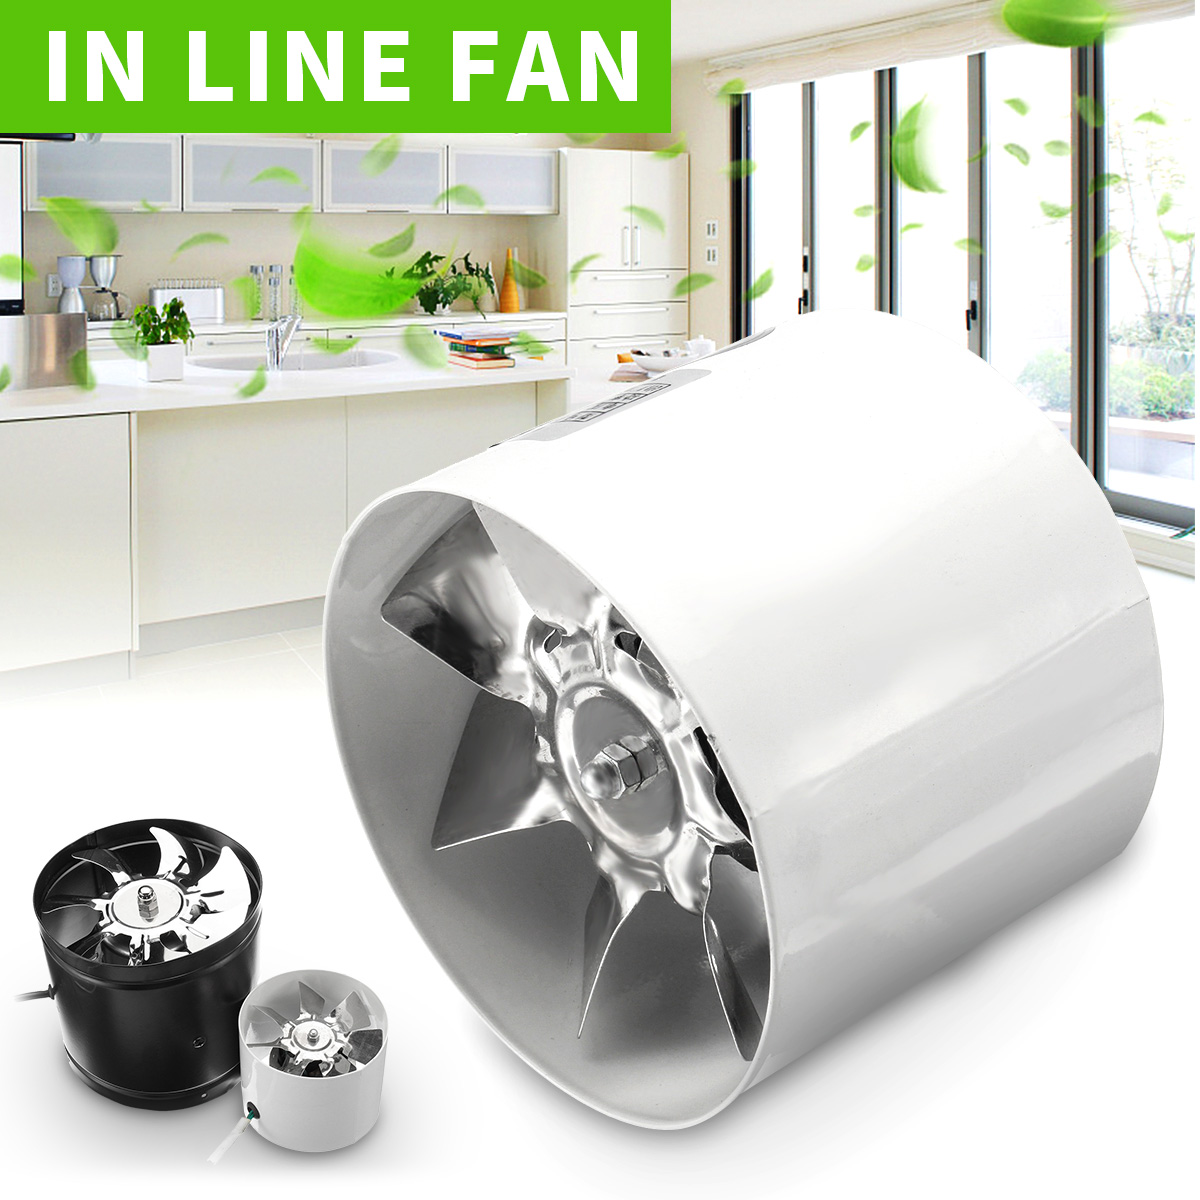 4/6inch 1080 m3/h In Line Fan Hydroponic Green Air Input Grow Cleaning Kitchen Ventilator Fan Bathroom In Line Air Blower Fan outdoor bbq barbecue fan air blower 4 x aa